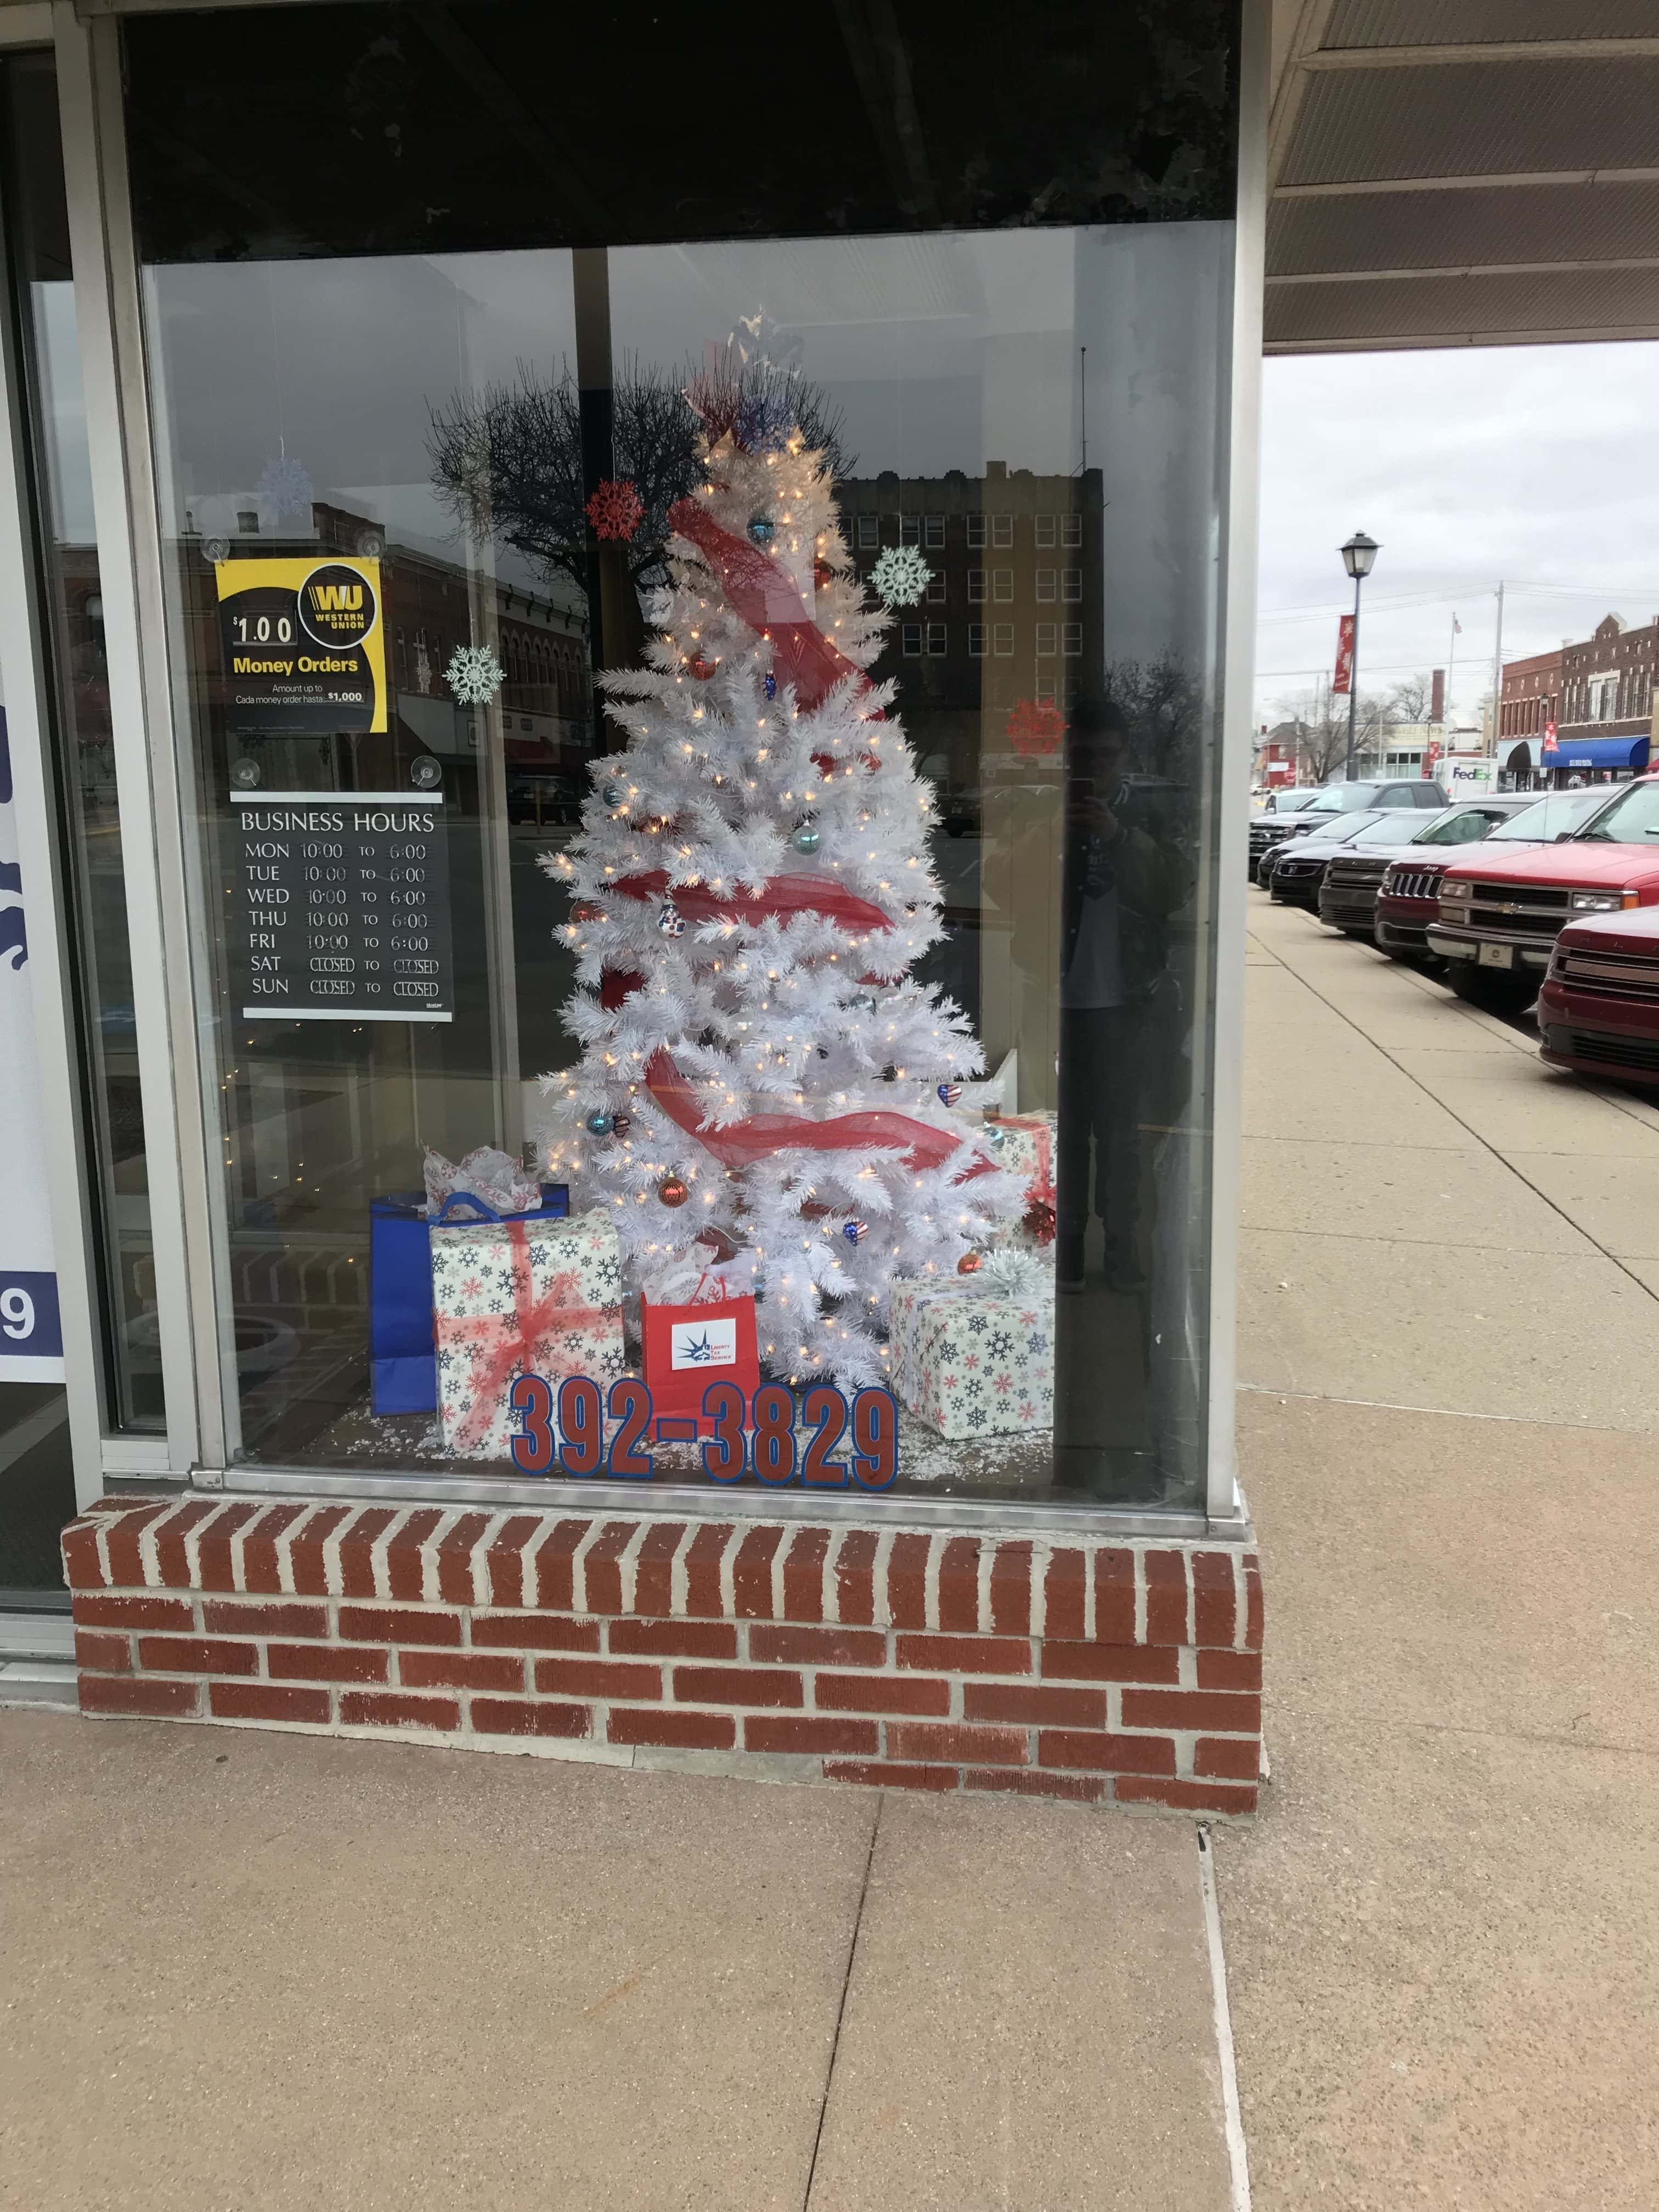 shelby county news - Giant Christmas Hours